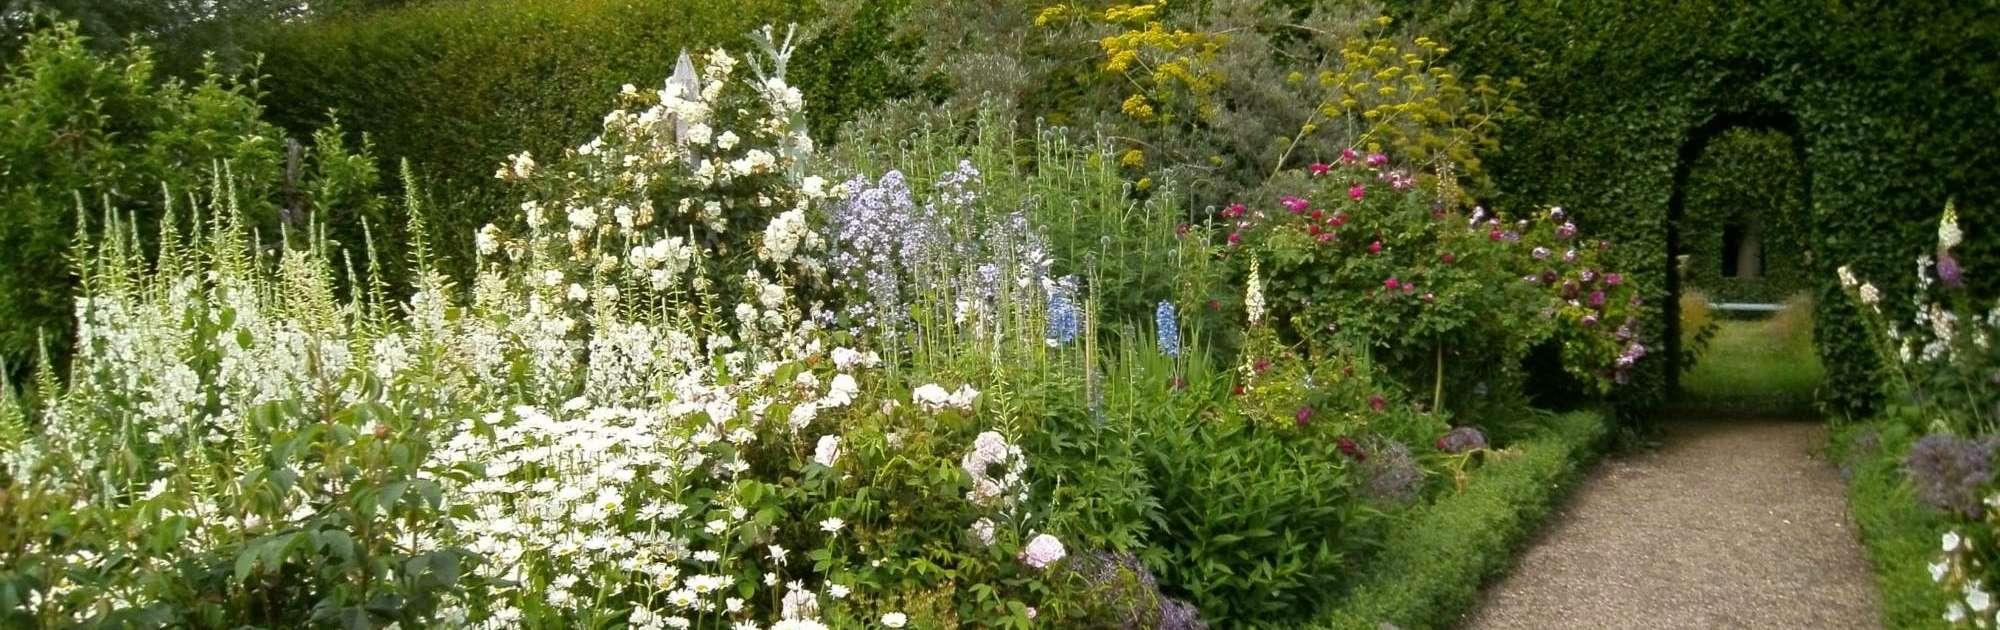 herbaceous_borders